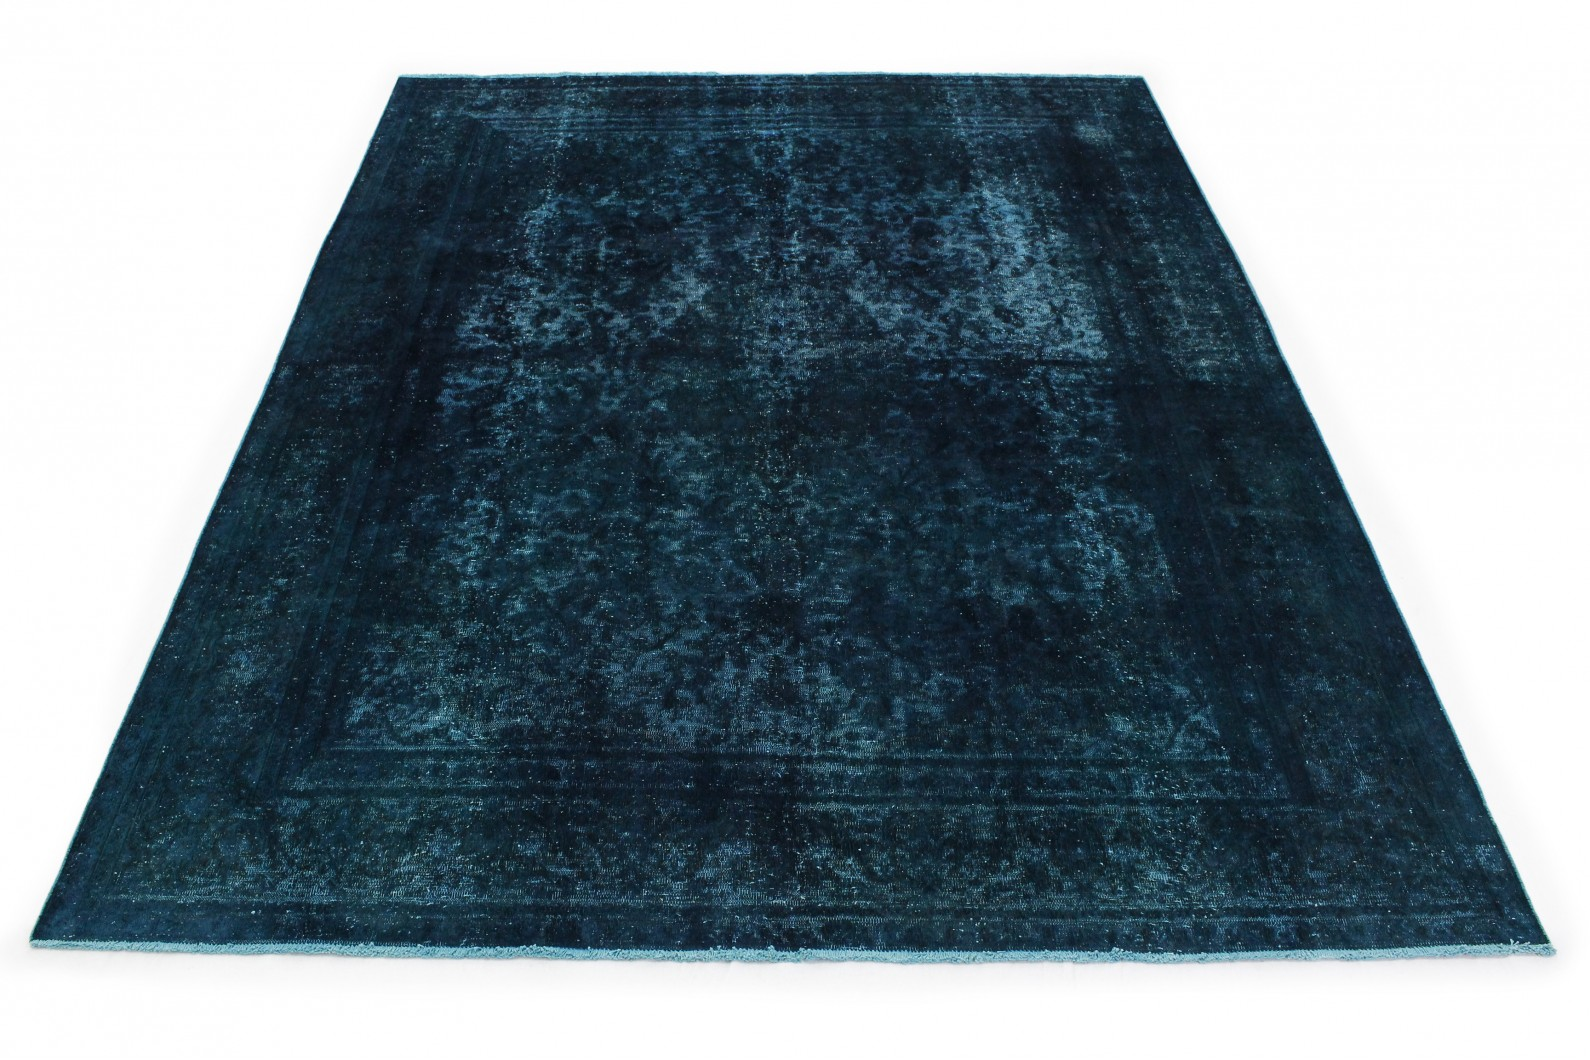 Vintage Teppich Blau in 370x280 (1 / 3)